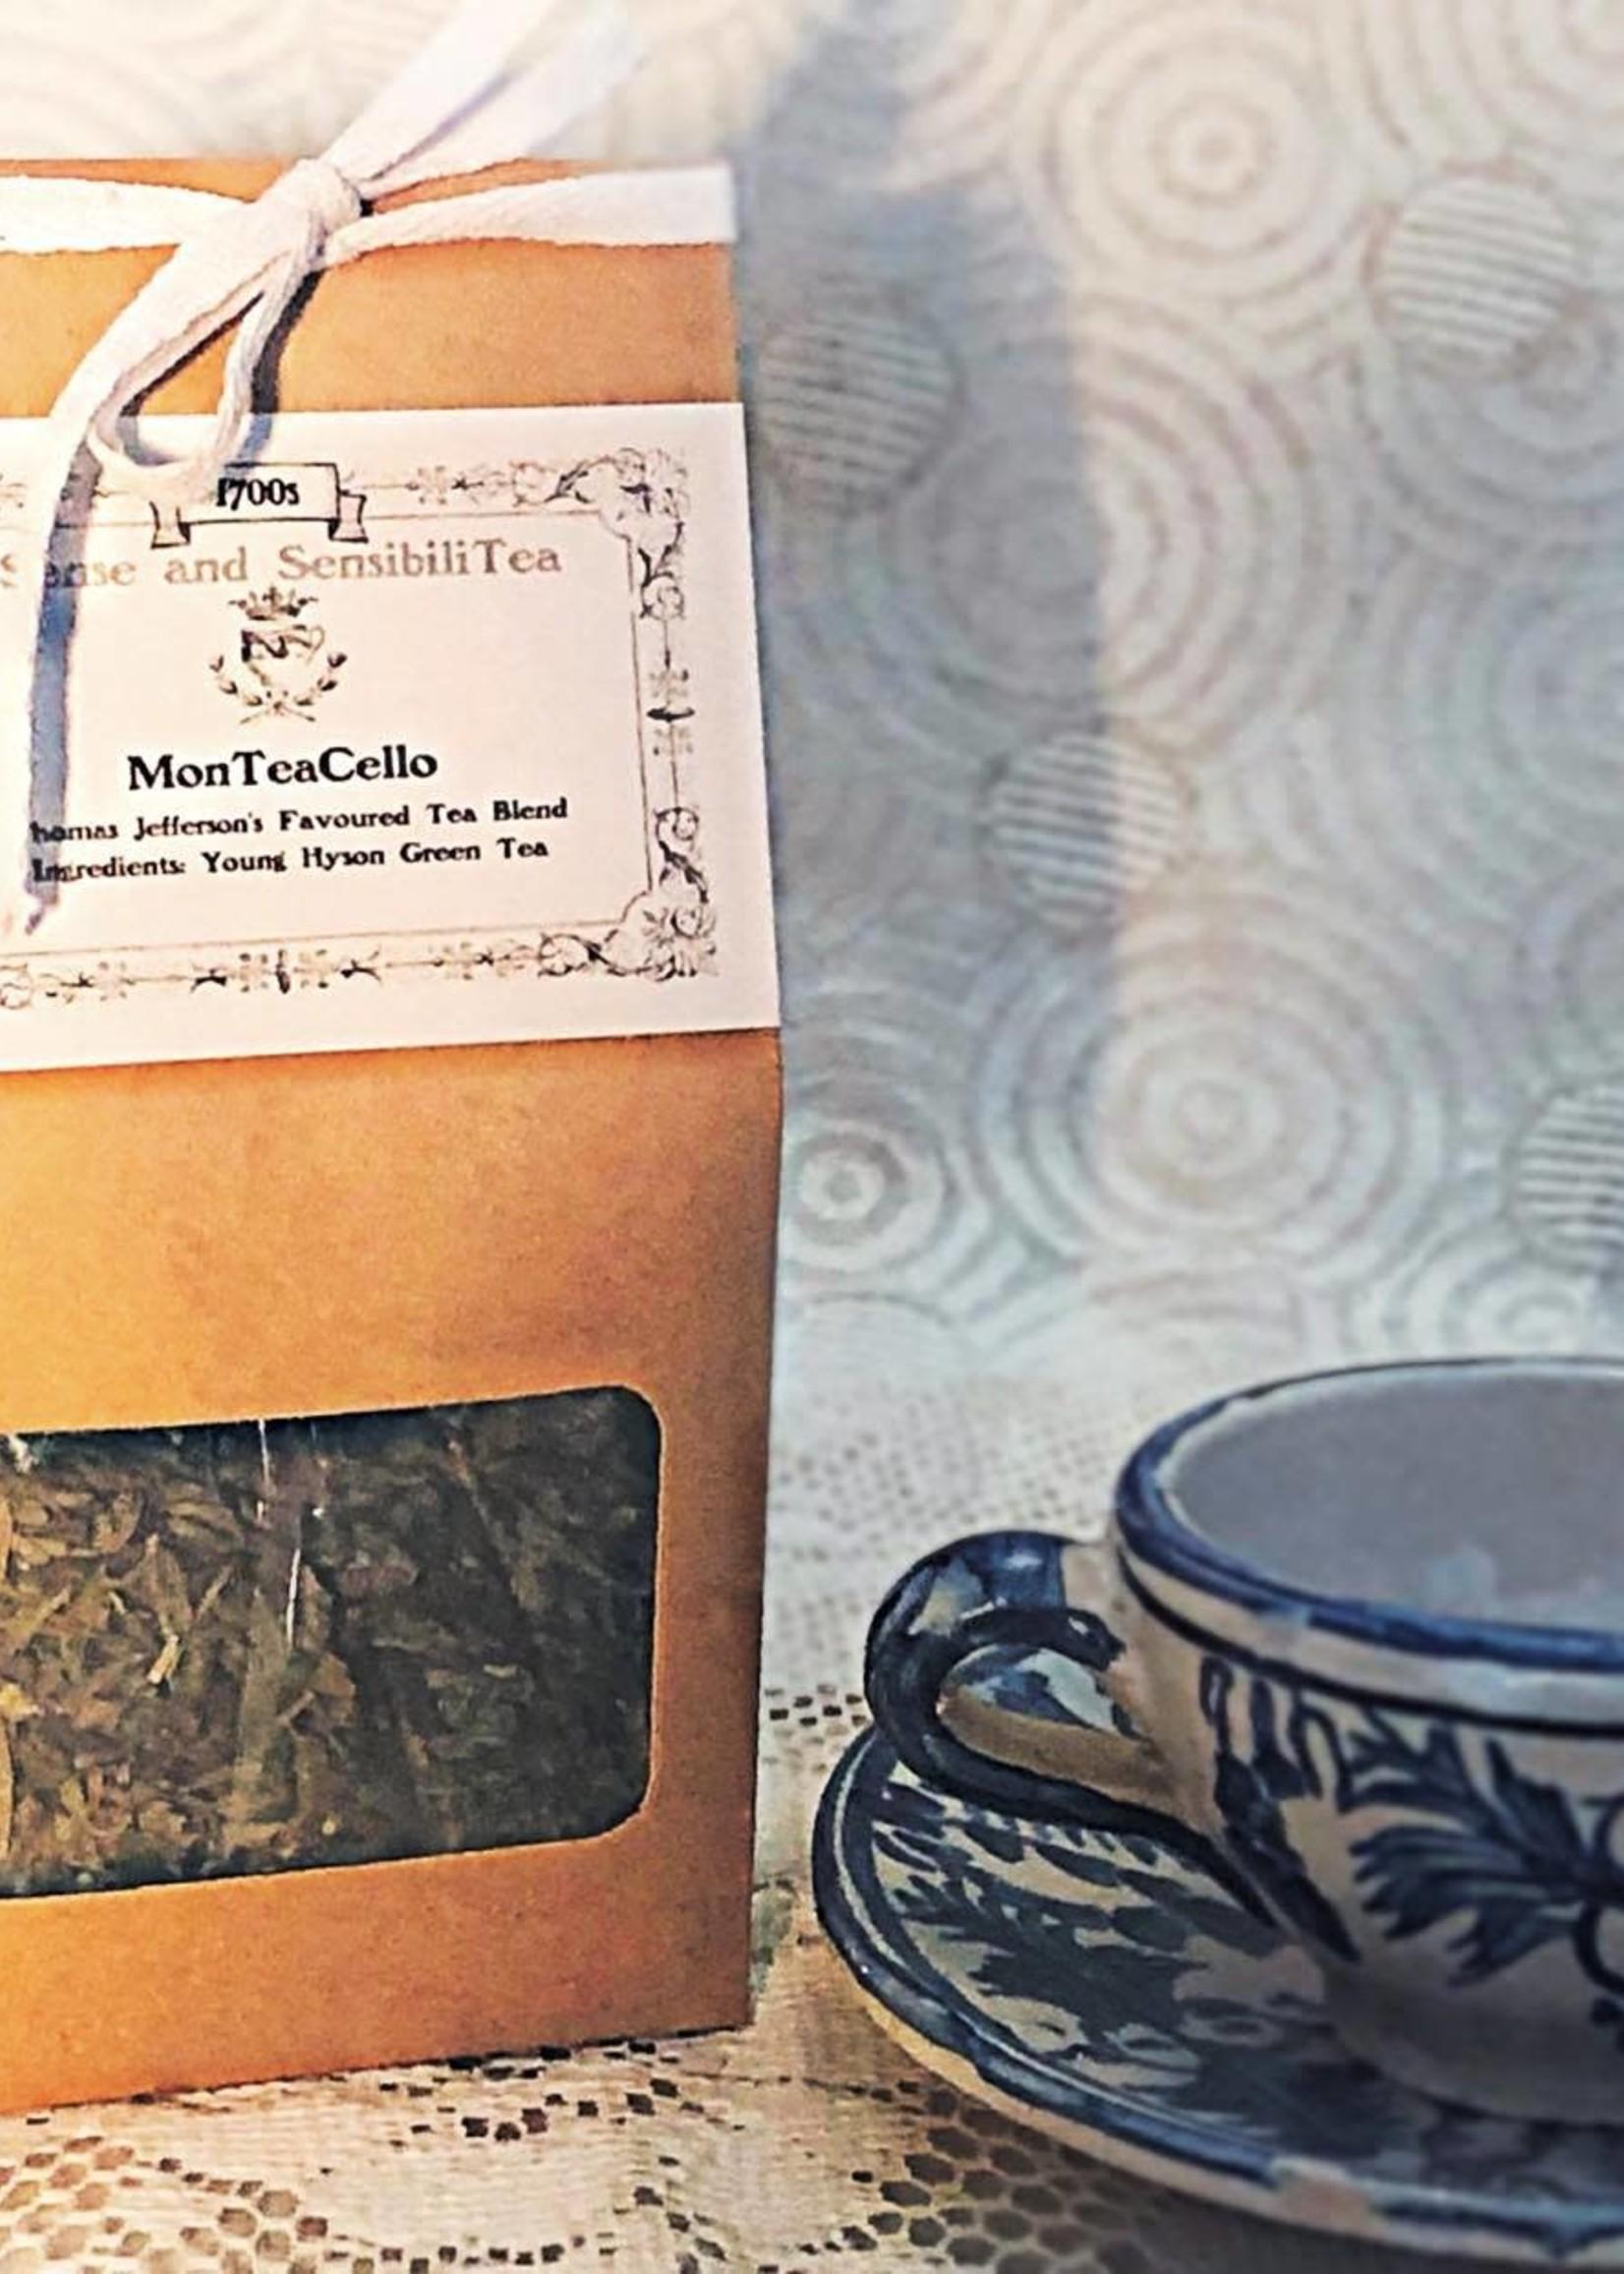 Sense and SensibiliTea 100g MonTeaCello (Green Tea) – 1700s